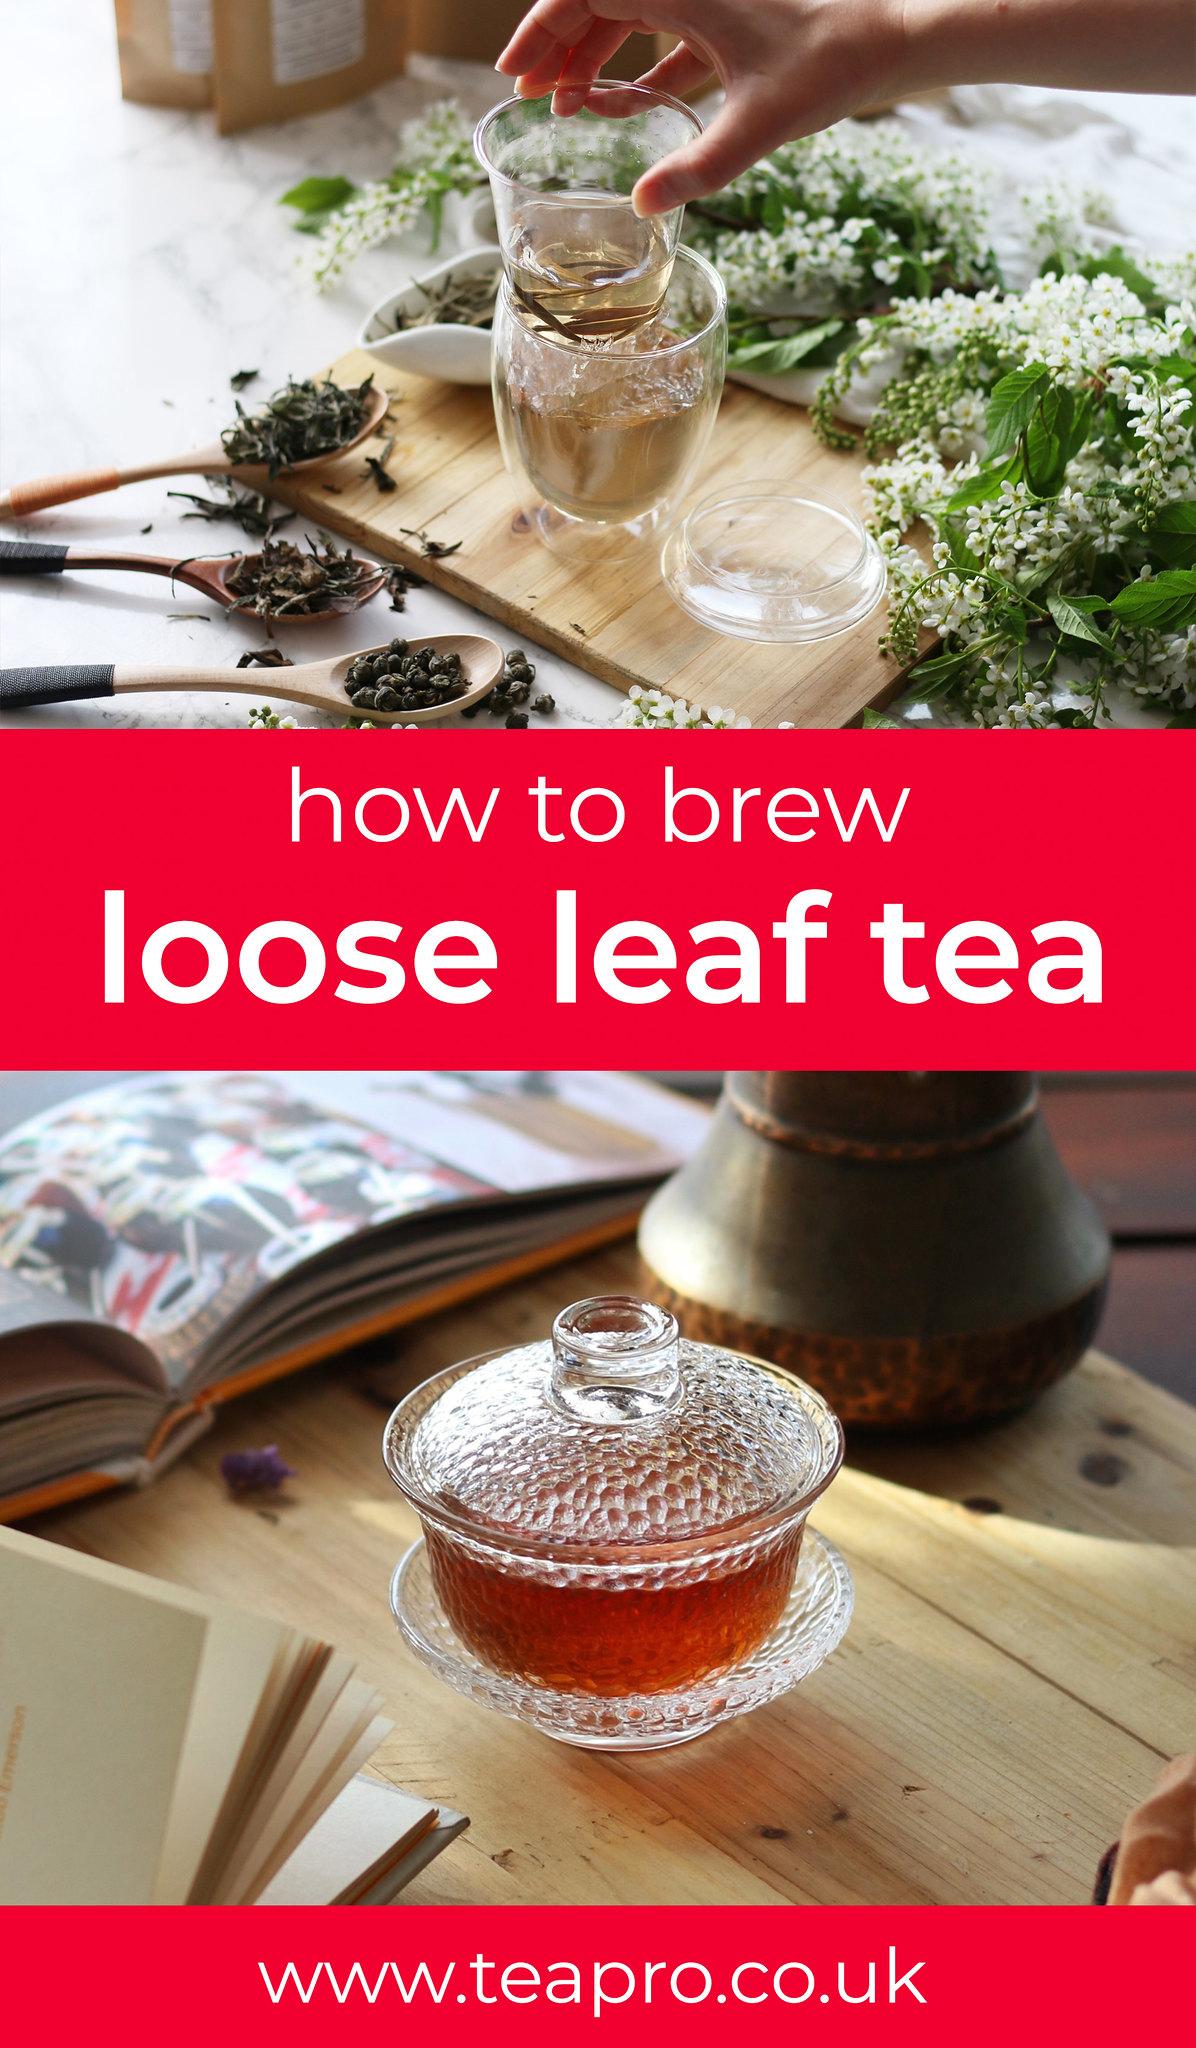 how-to-brew-loose-leaf-tea